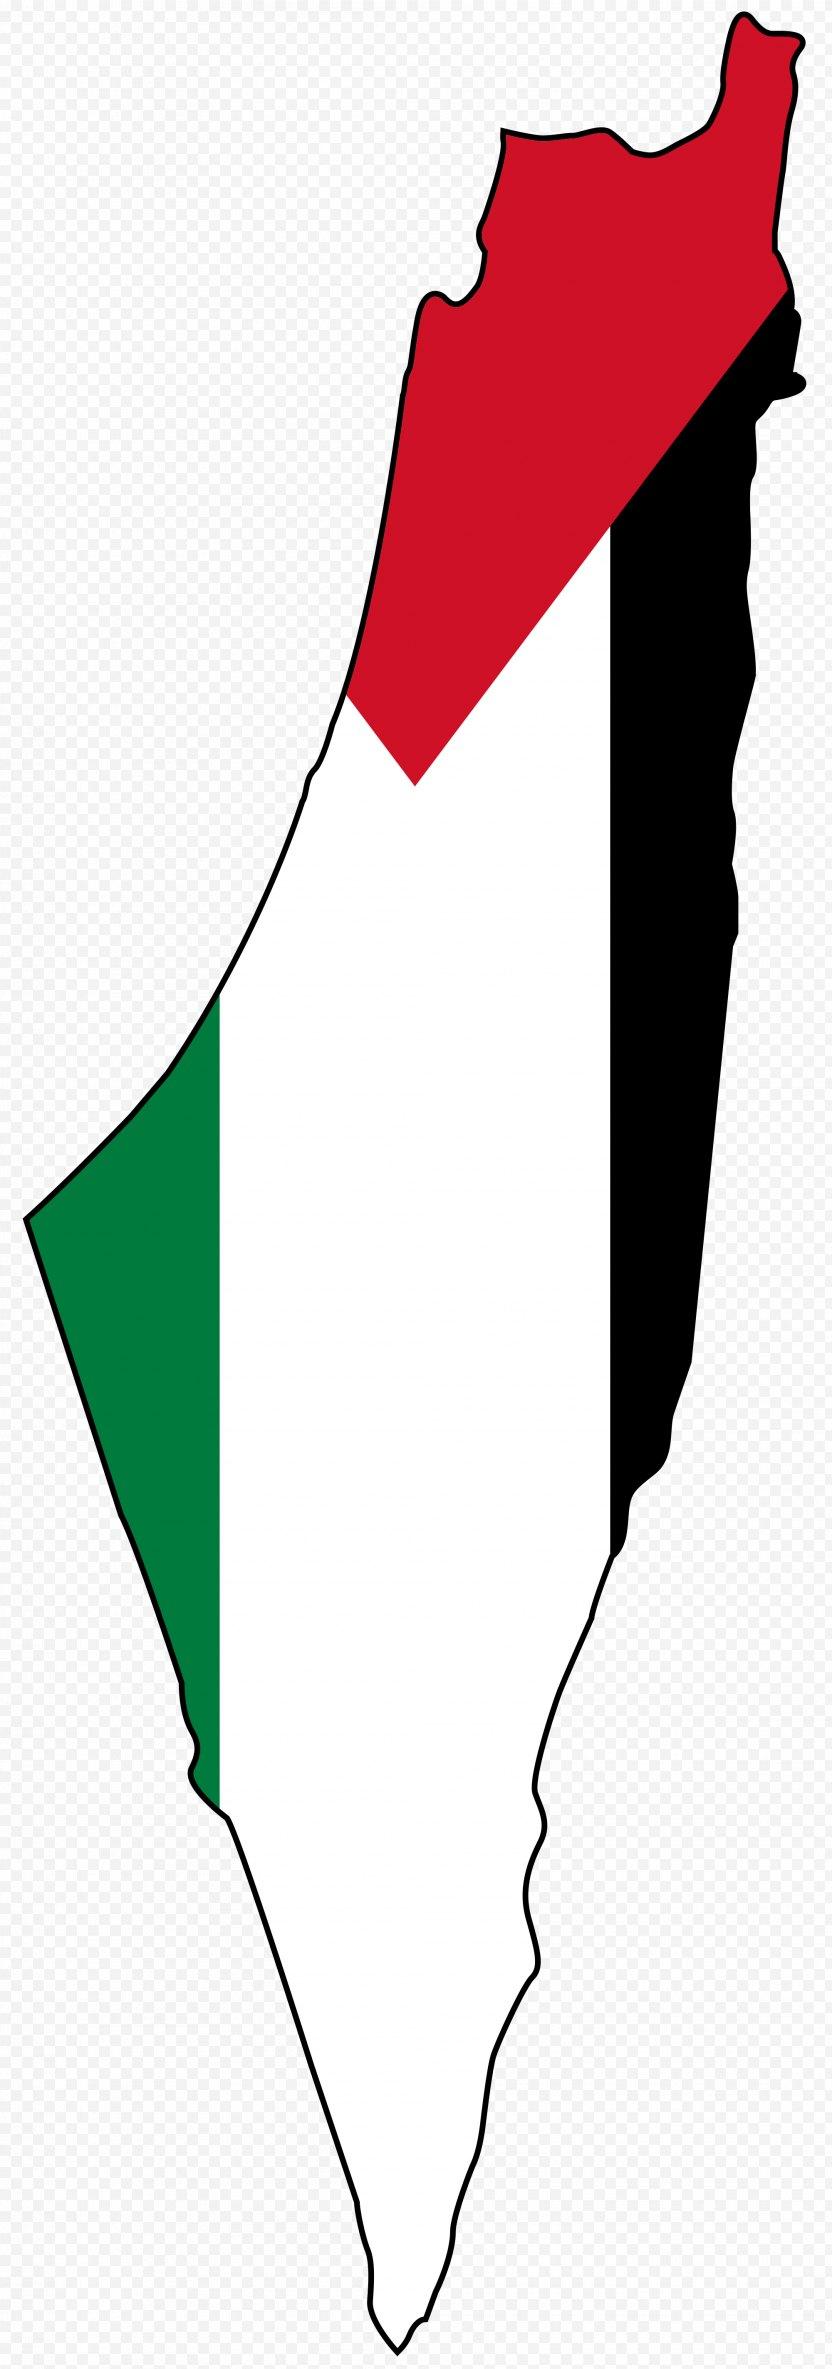 Israel State Of Palestine Mandatory Flag Map PNG